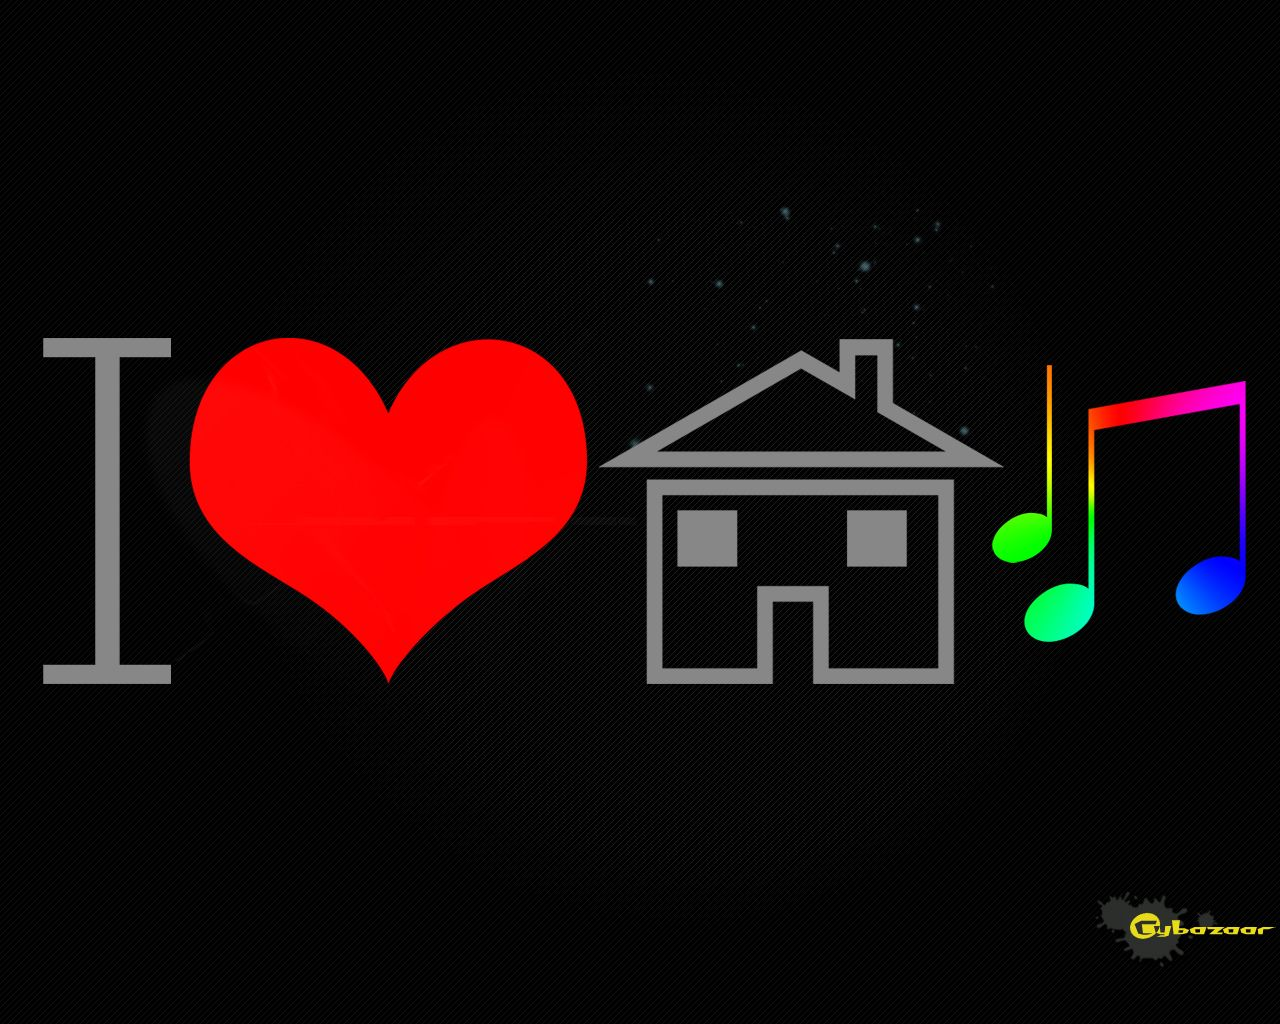 I LOVE HOUSE MUSIC House music, Trance music, I love house